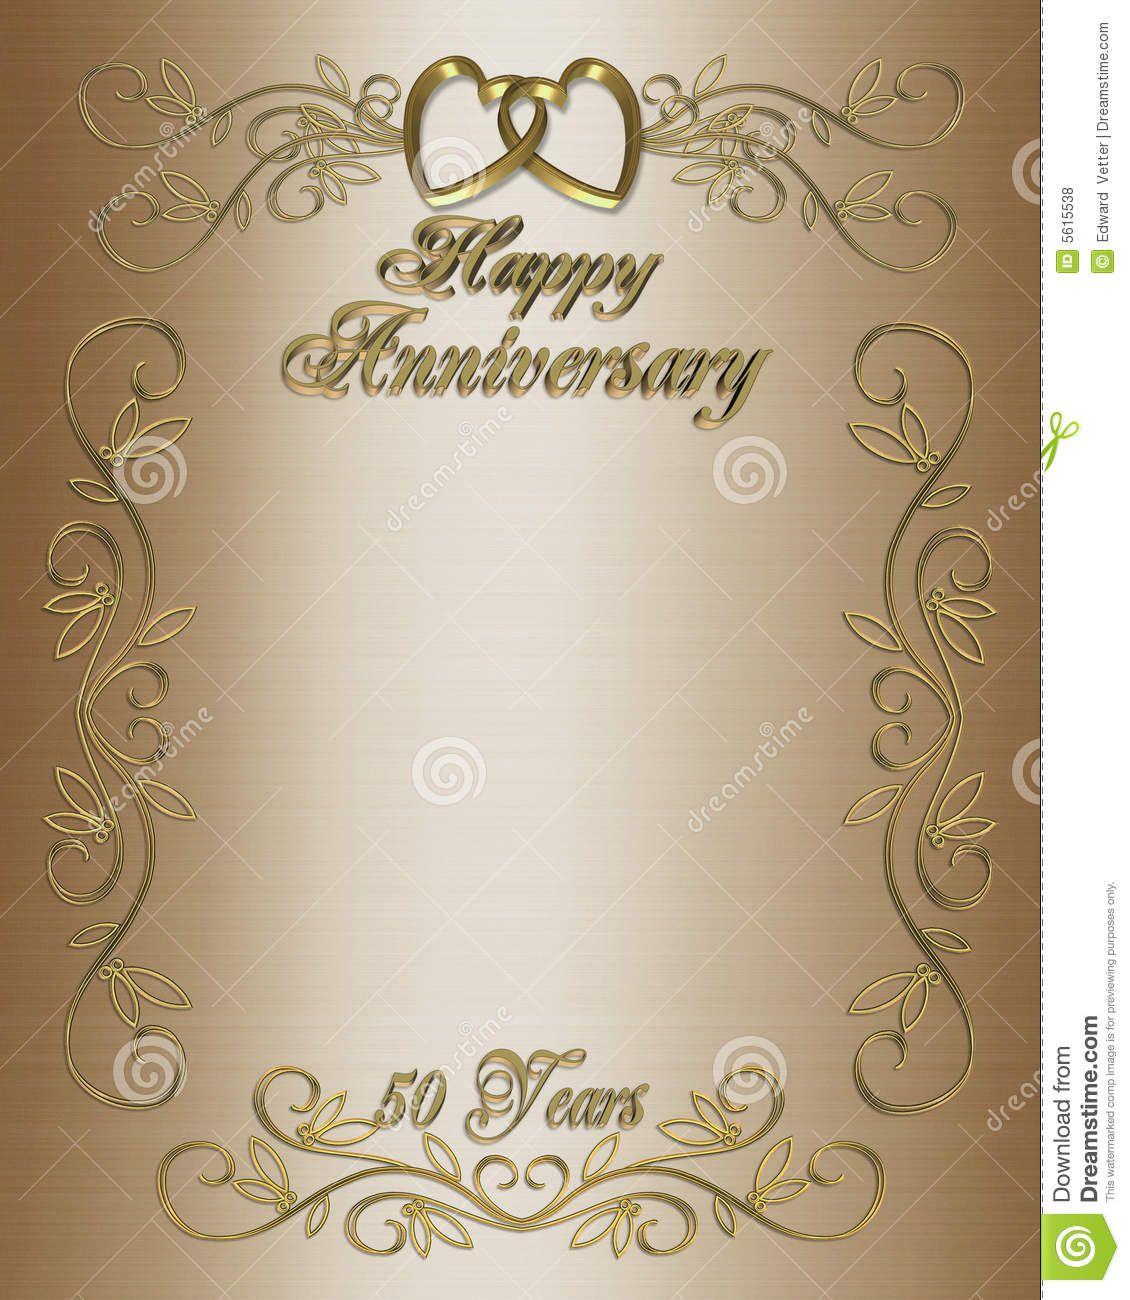 001 Wondrou 50th Anniversary Invitation Design High Def  Designs Wedding Template Microsoft Word Surprise Party Wording Card IdeaFull